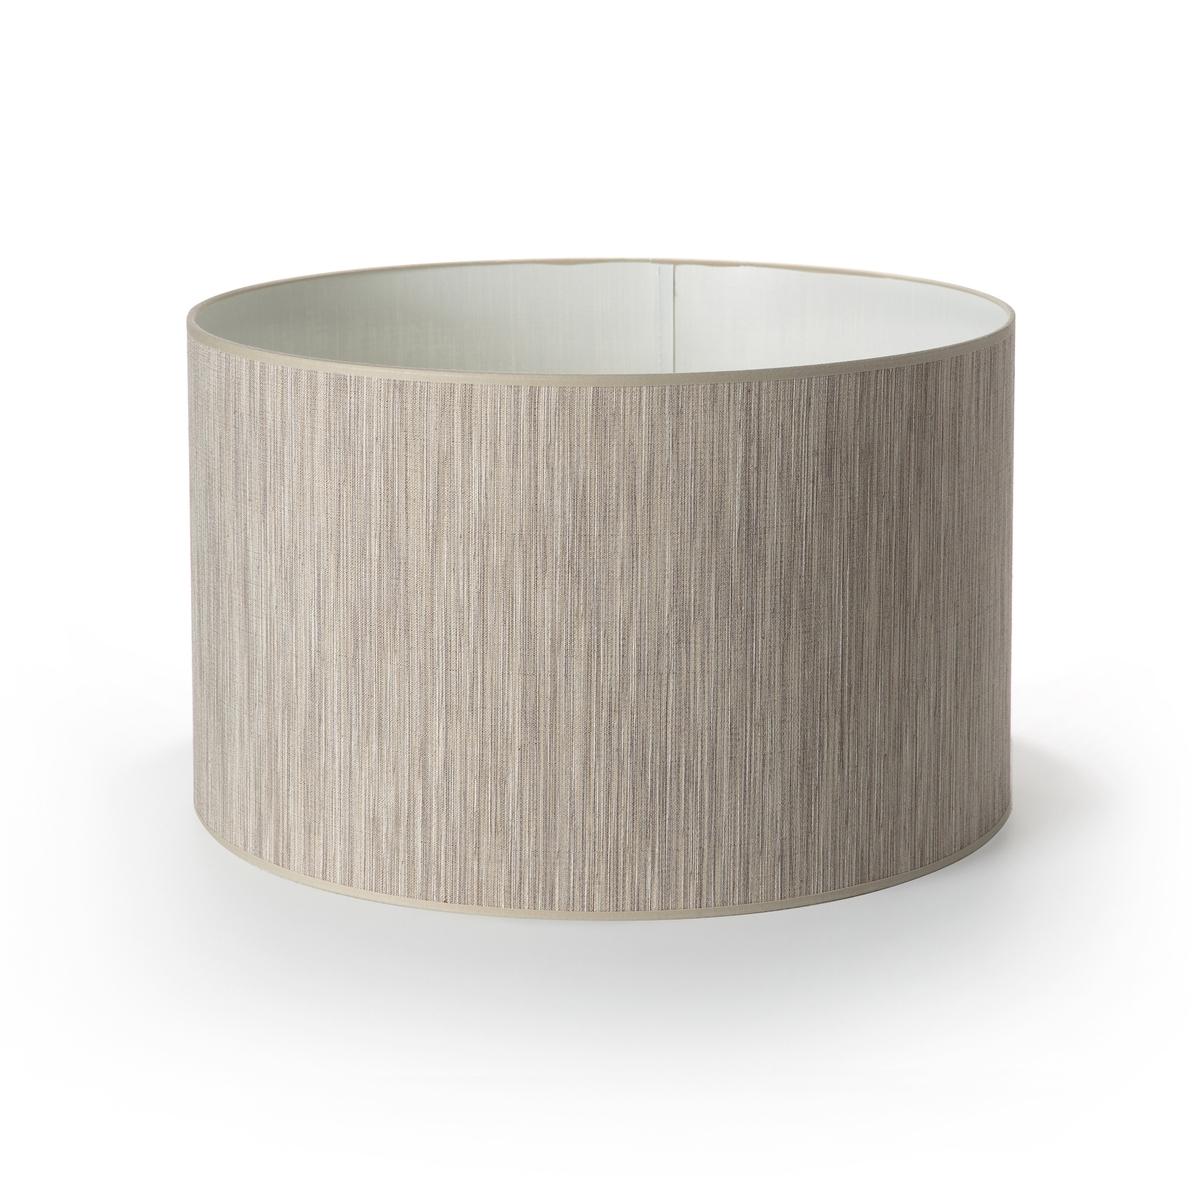 Абажур La Redoute Из текстурной ткани Wombat 5 размеров диаметр 55 см бежевый